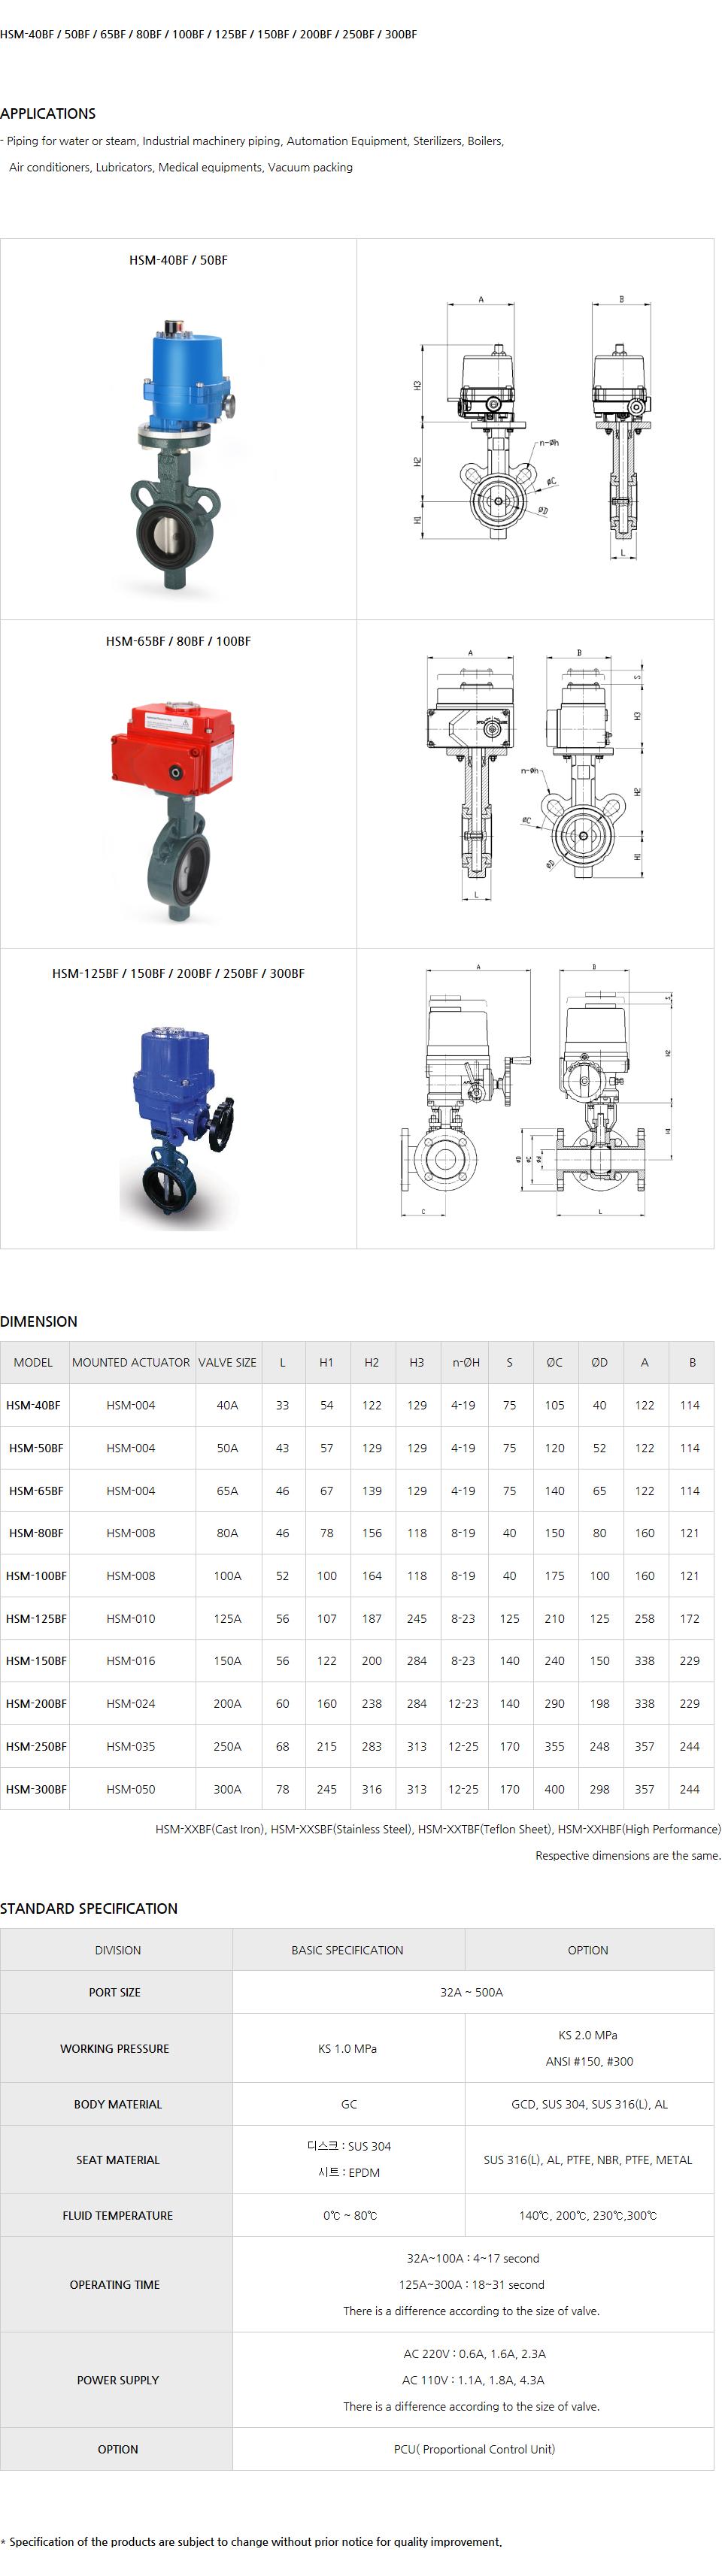 HYOSHIN MECHATRONICS Electric Actuator Butterfly Valve HSM-BF-Series